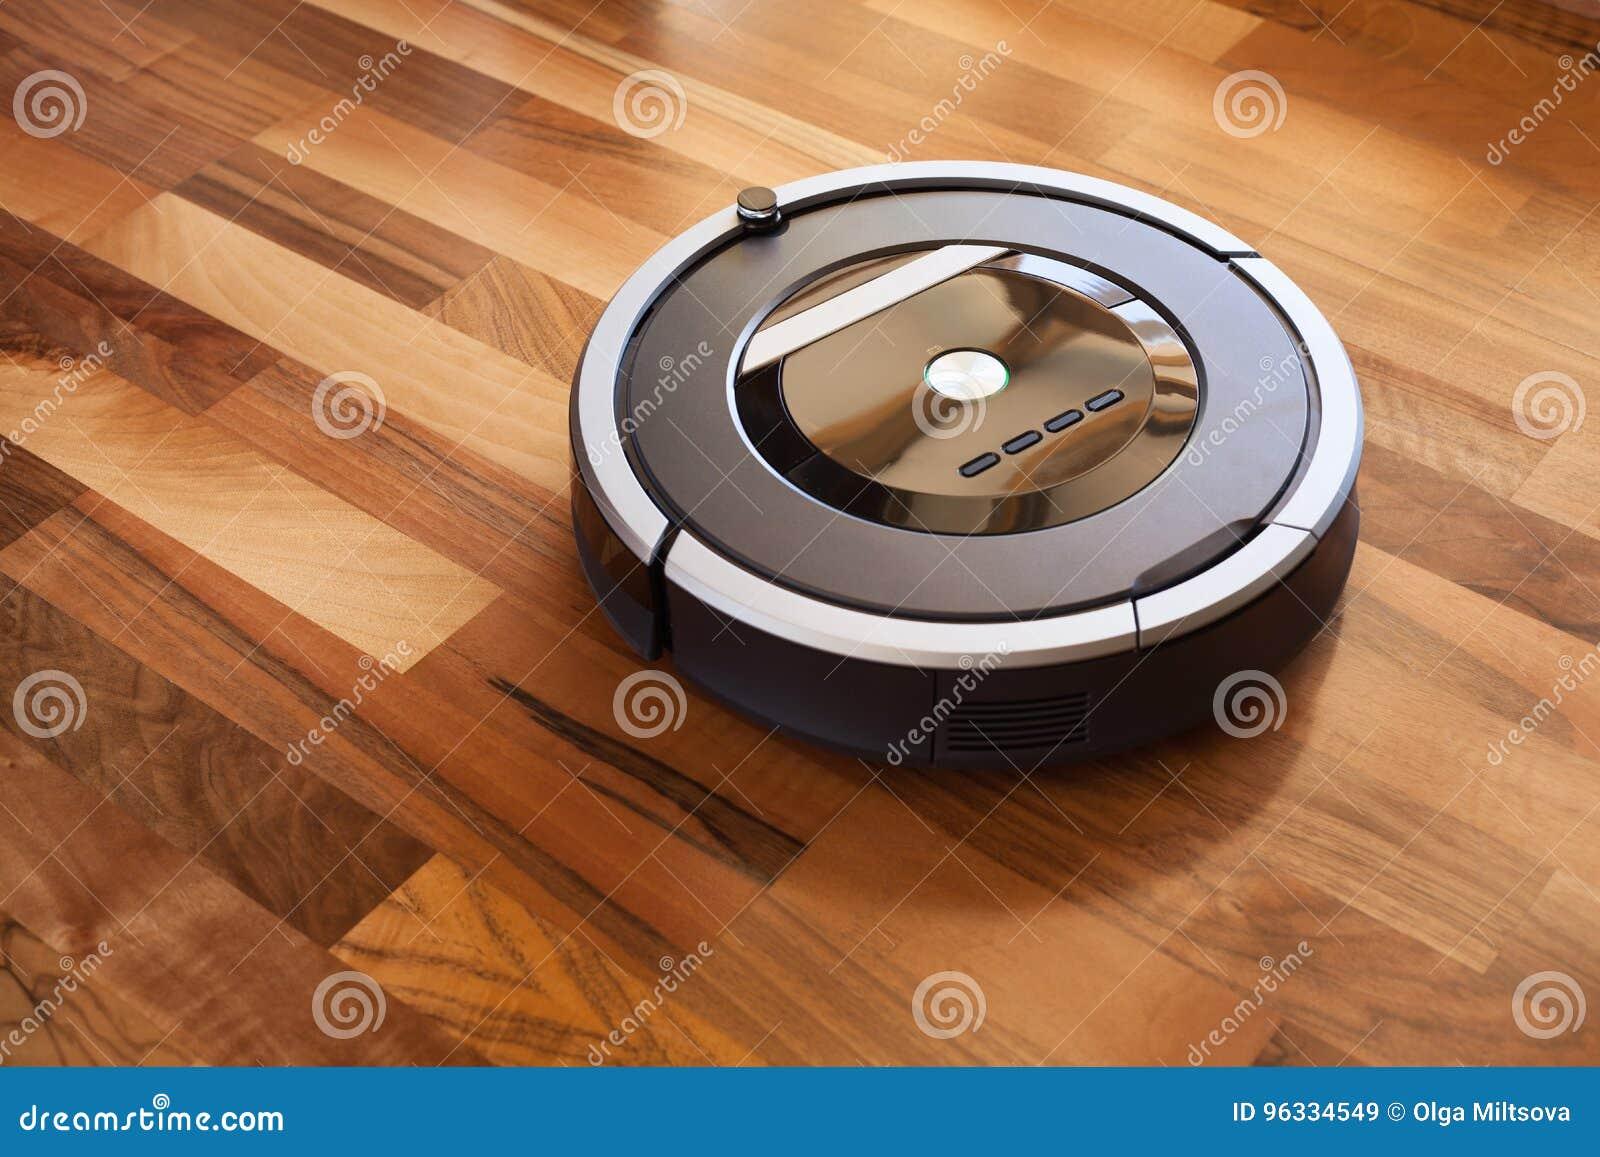 Robotic Vacuum Cleaner On Laminate Wood Floor Smart